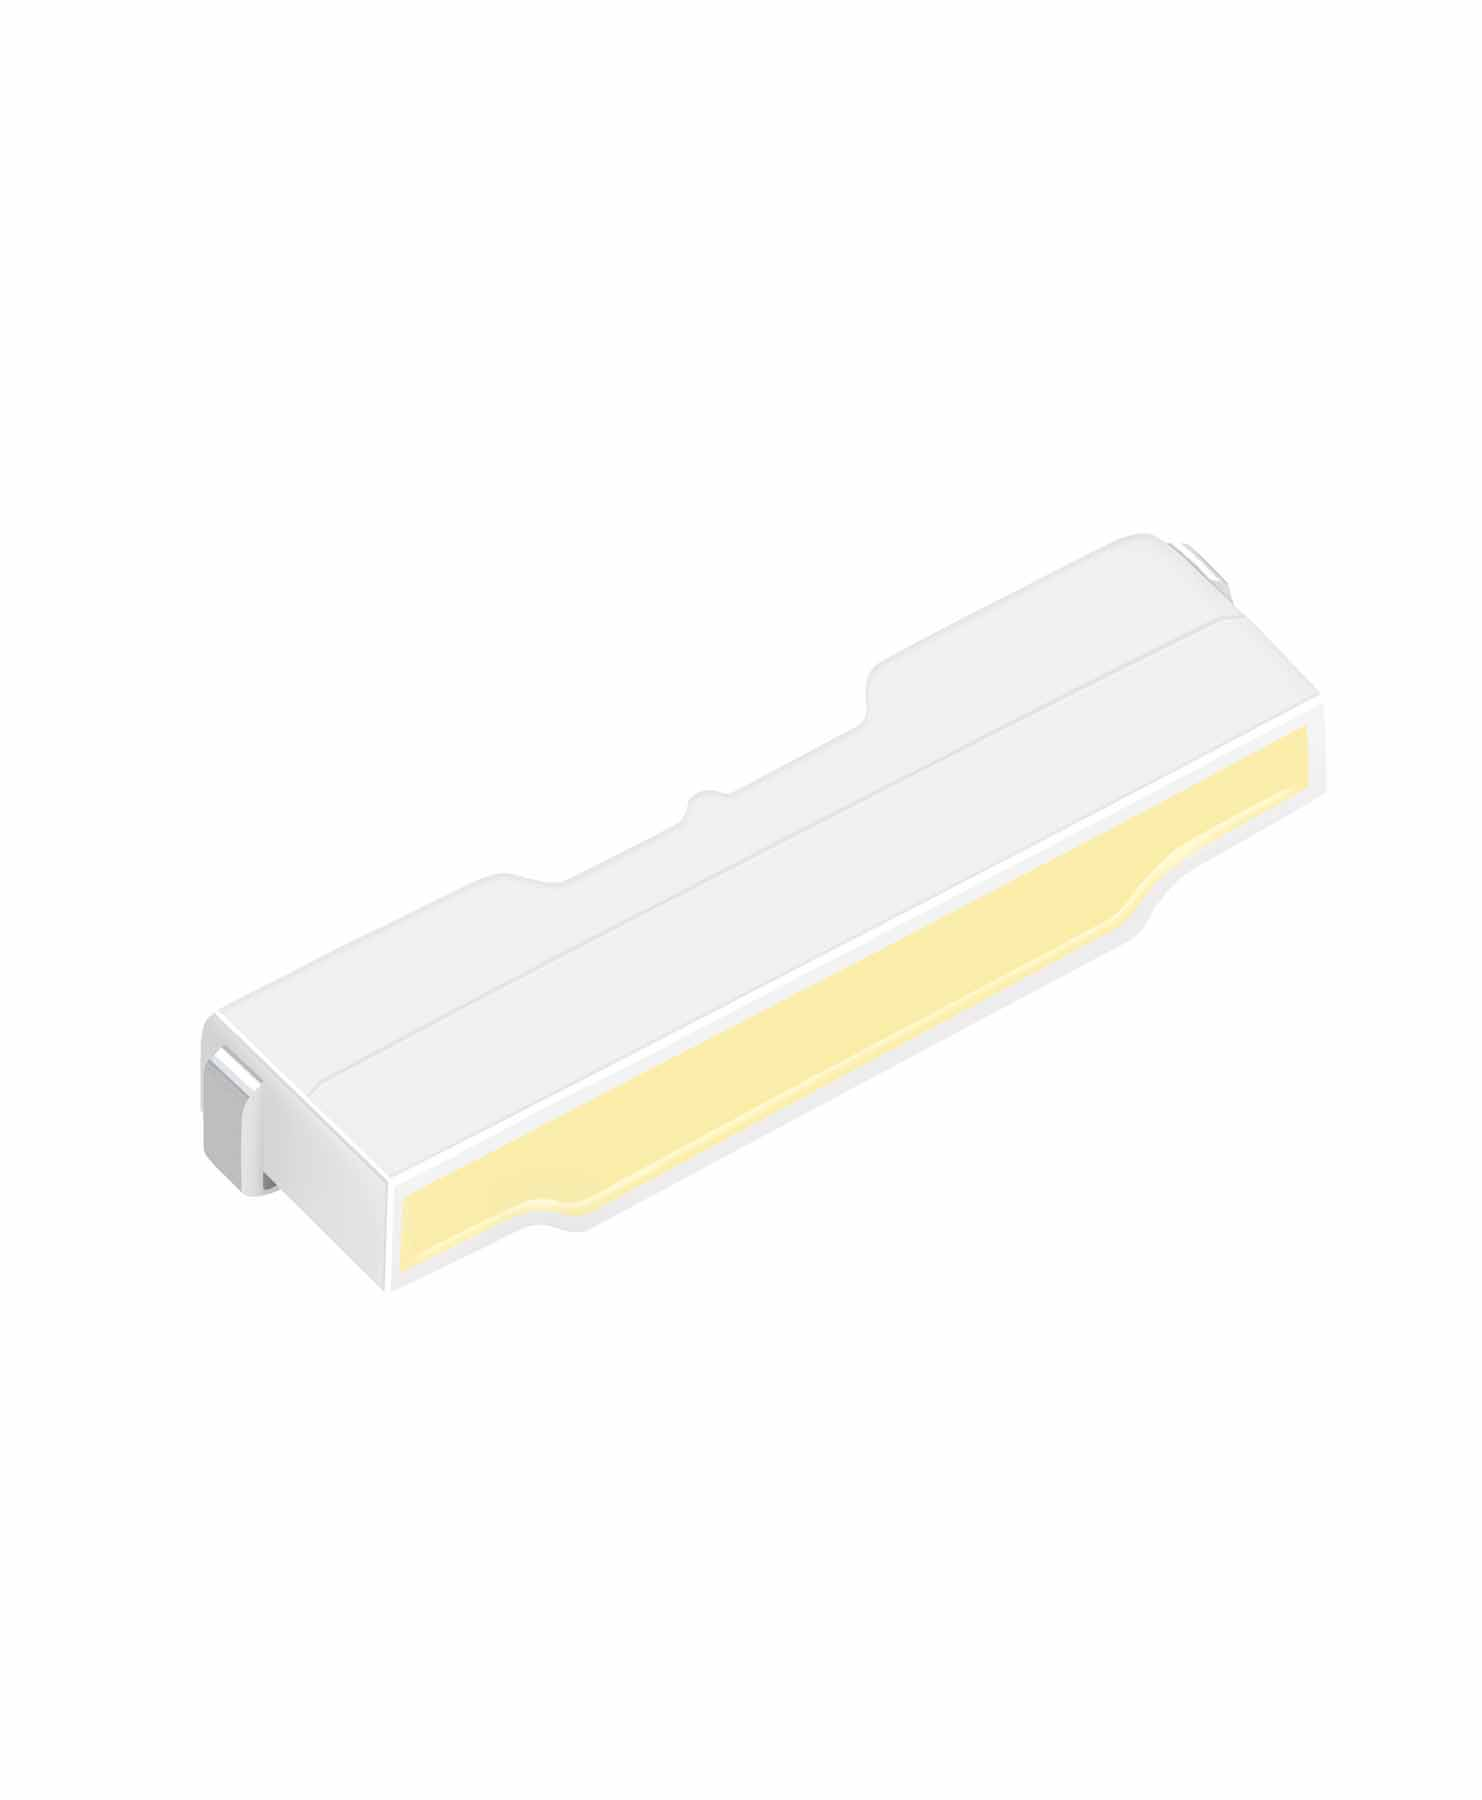 Osram: Mini-LEDs für stromsparende LCDs mit Quantenpunkten - Microsideled 3806 (Bild: Osram)